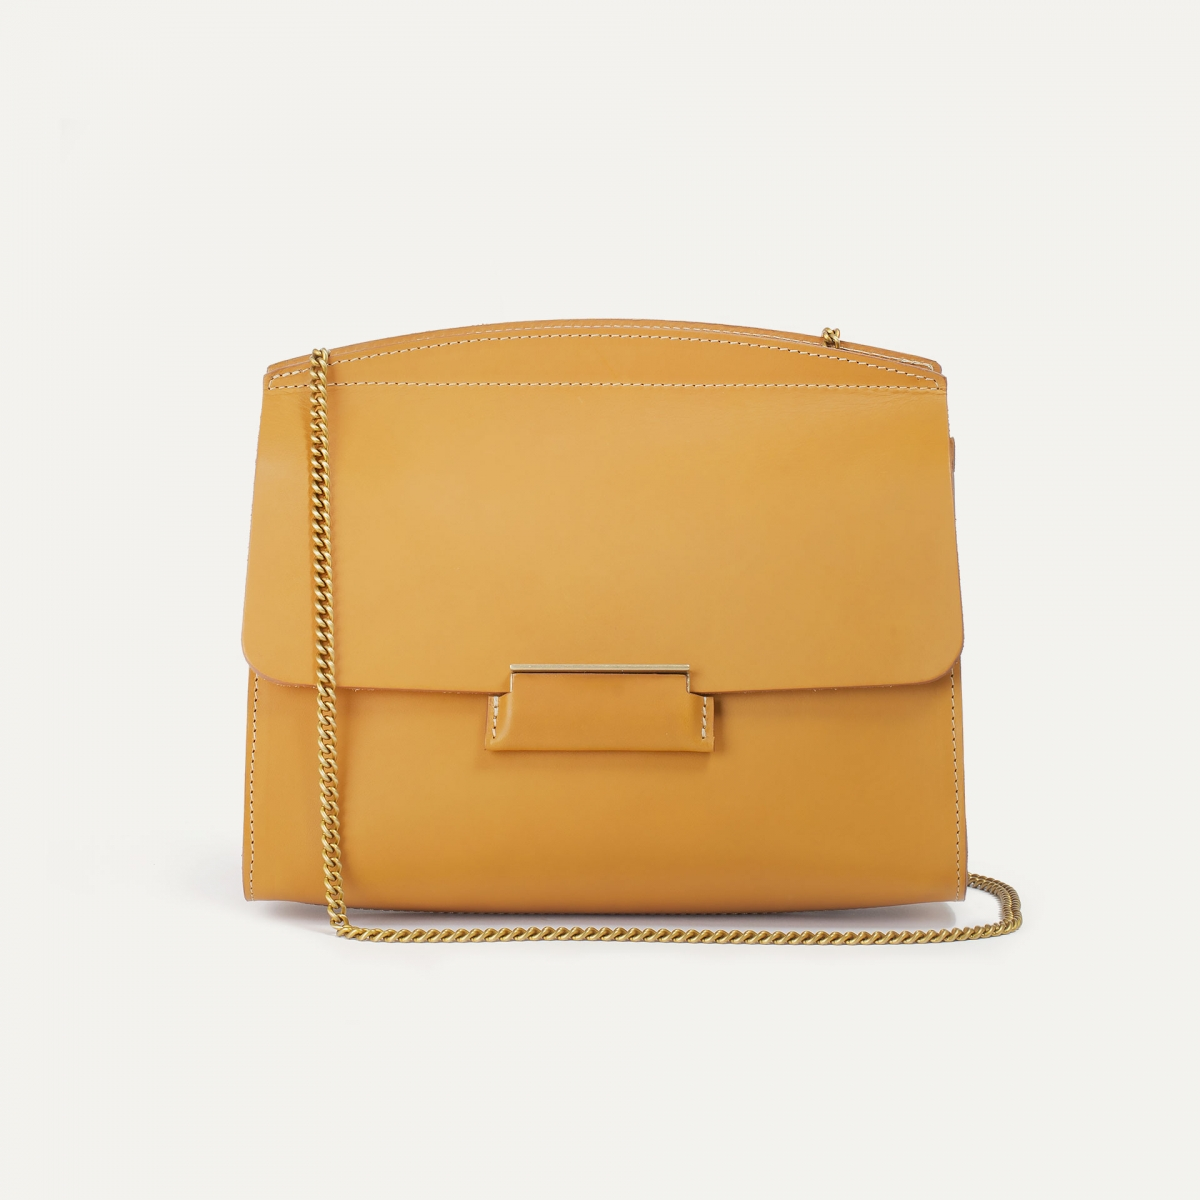 Origami S clutch bag - Honey (image n°2)